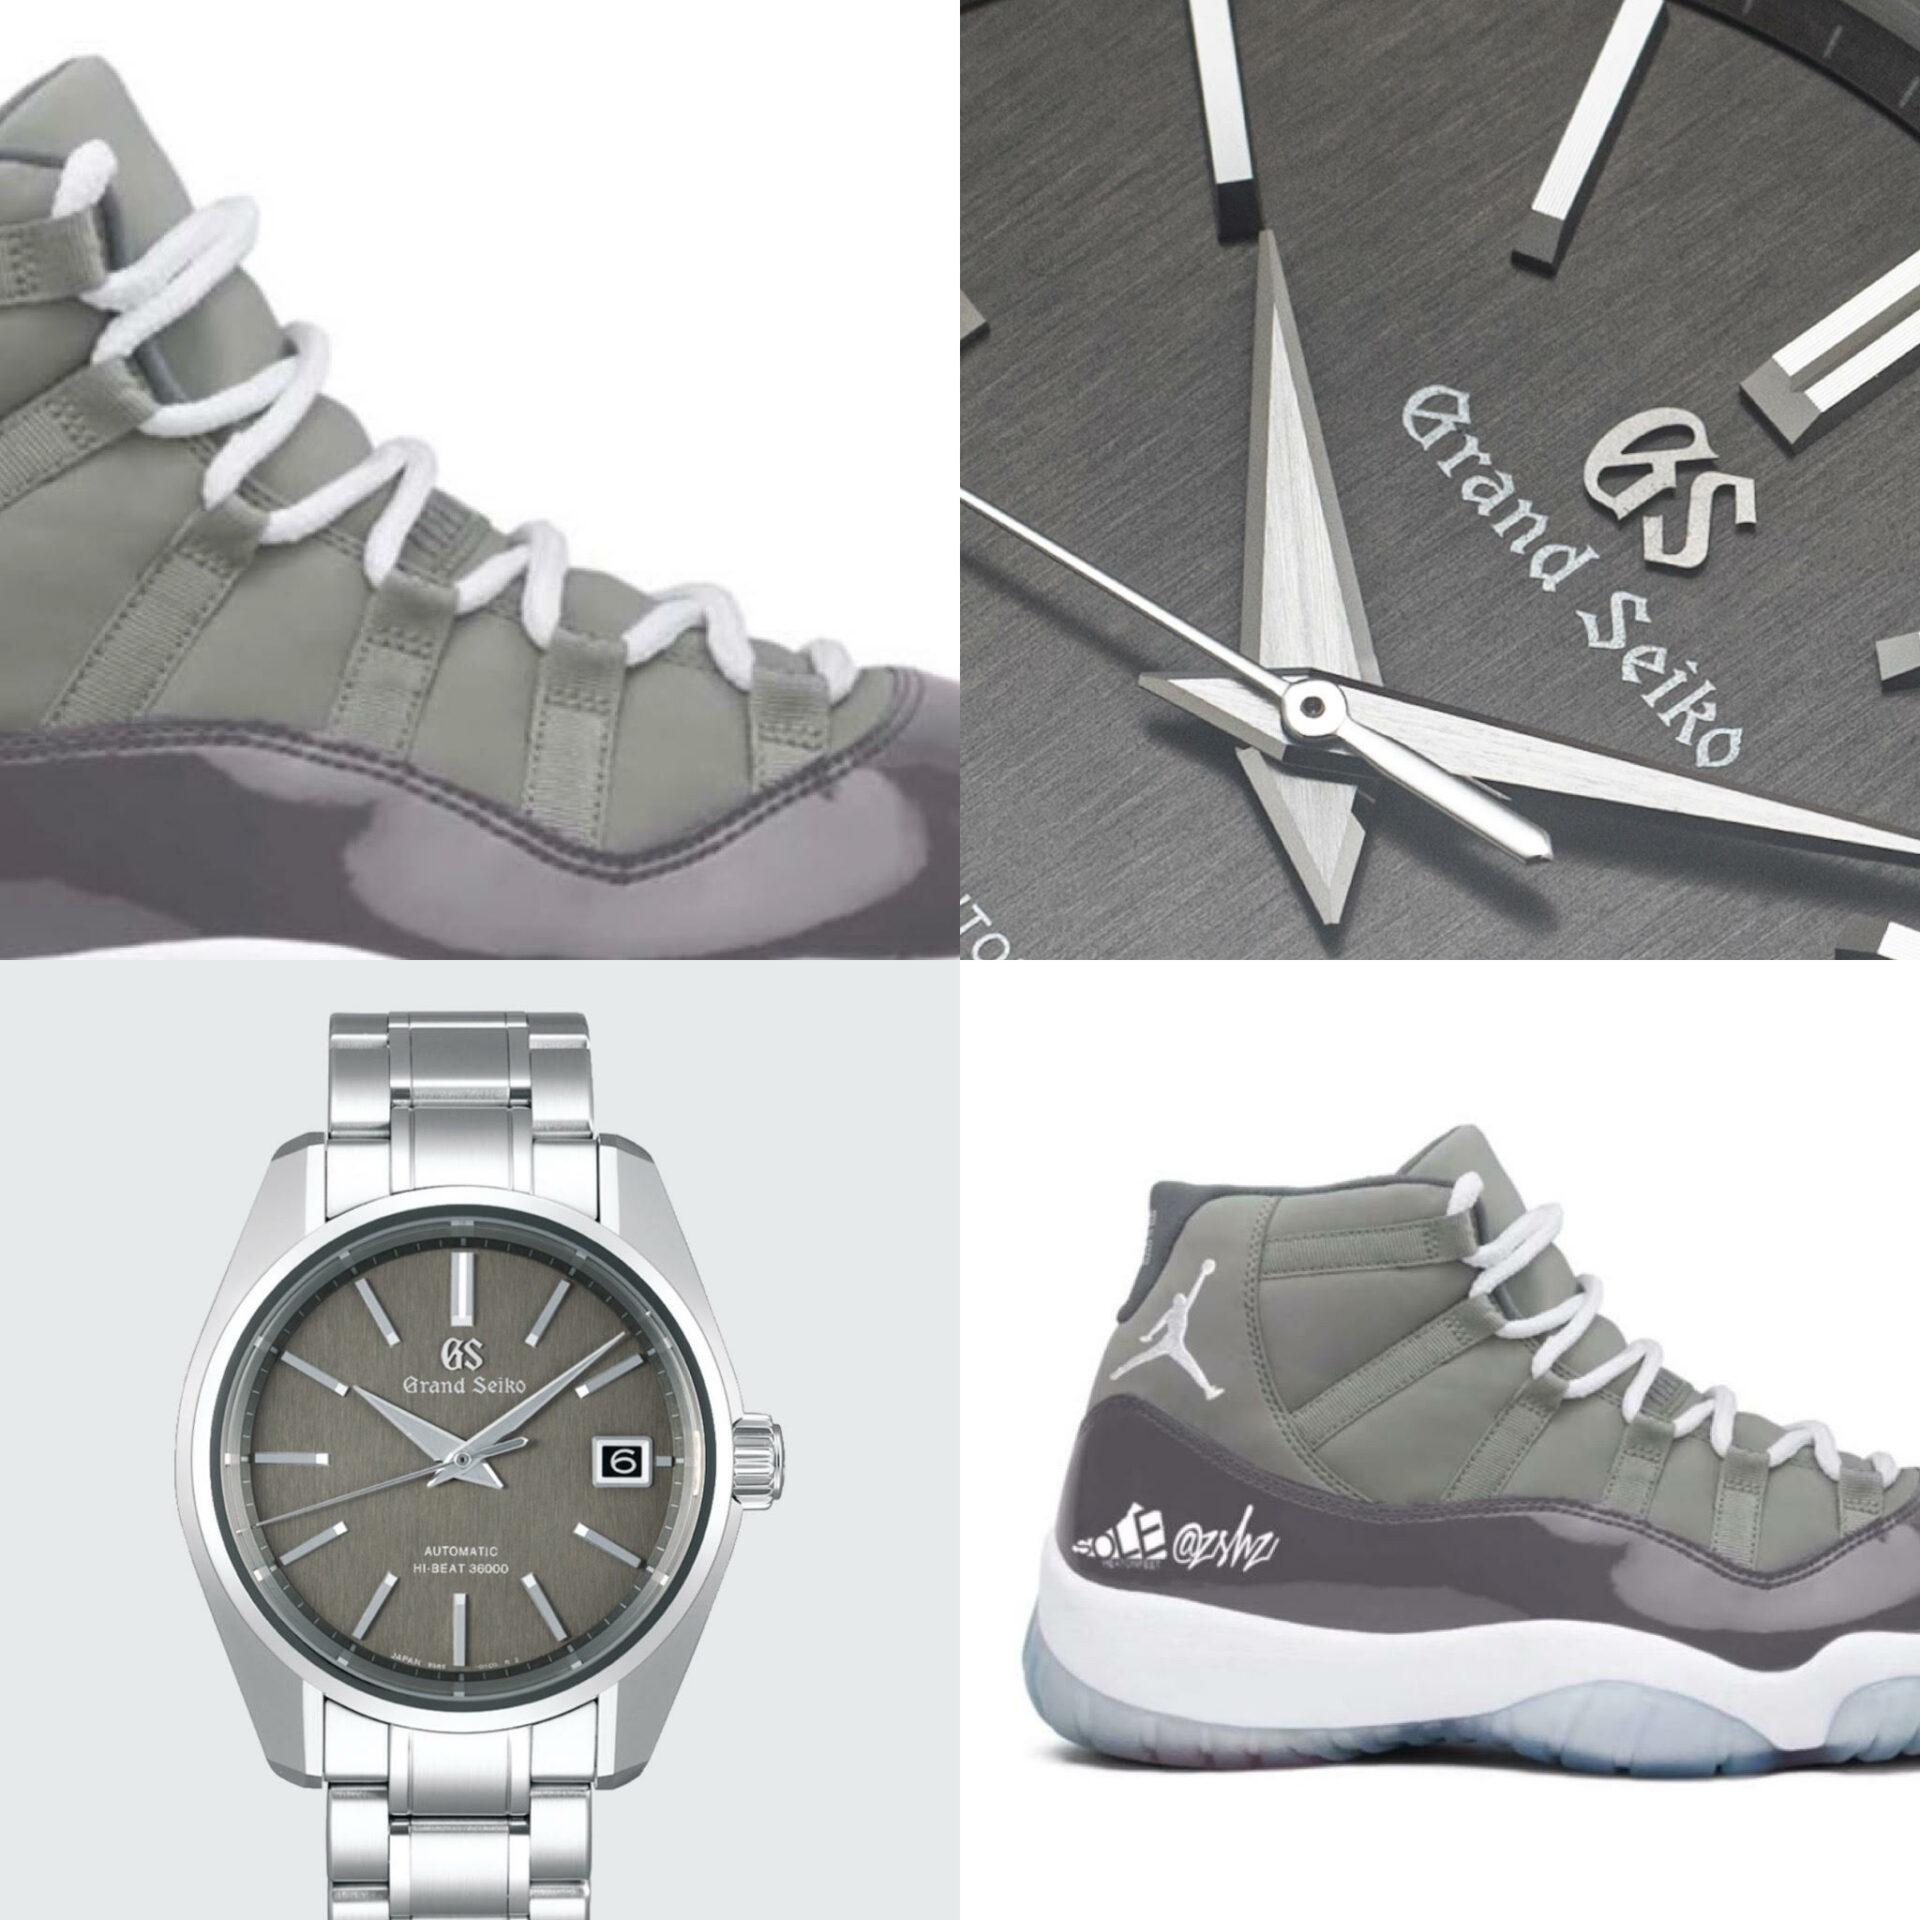 #Kixntix: The brushed granite-cool of the Grand Seiko SBGH279 meets a killer pair of Nike Air Jordans